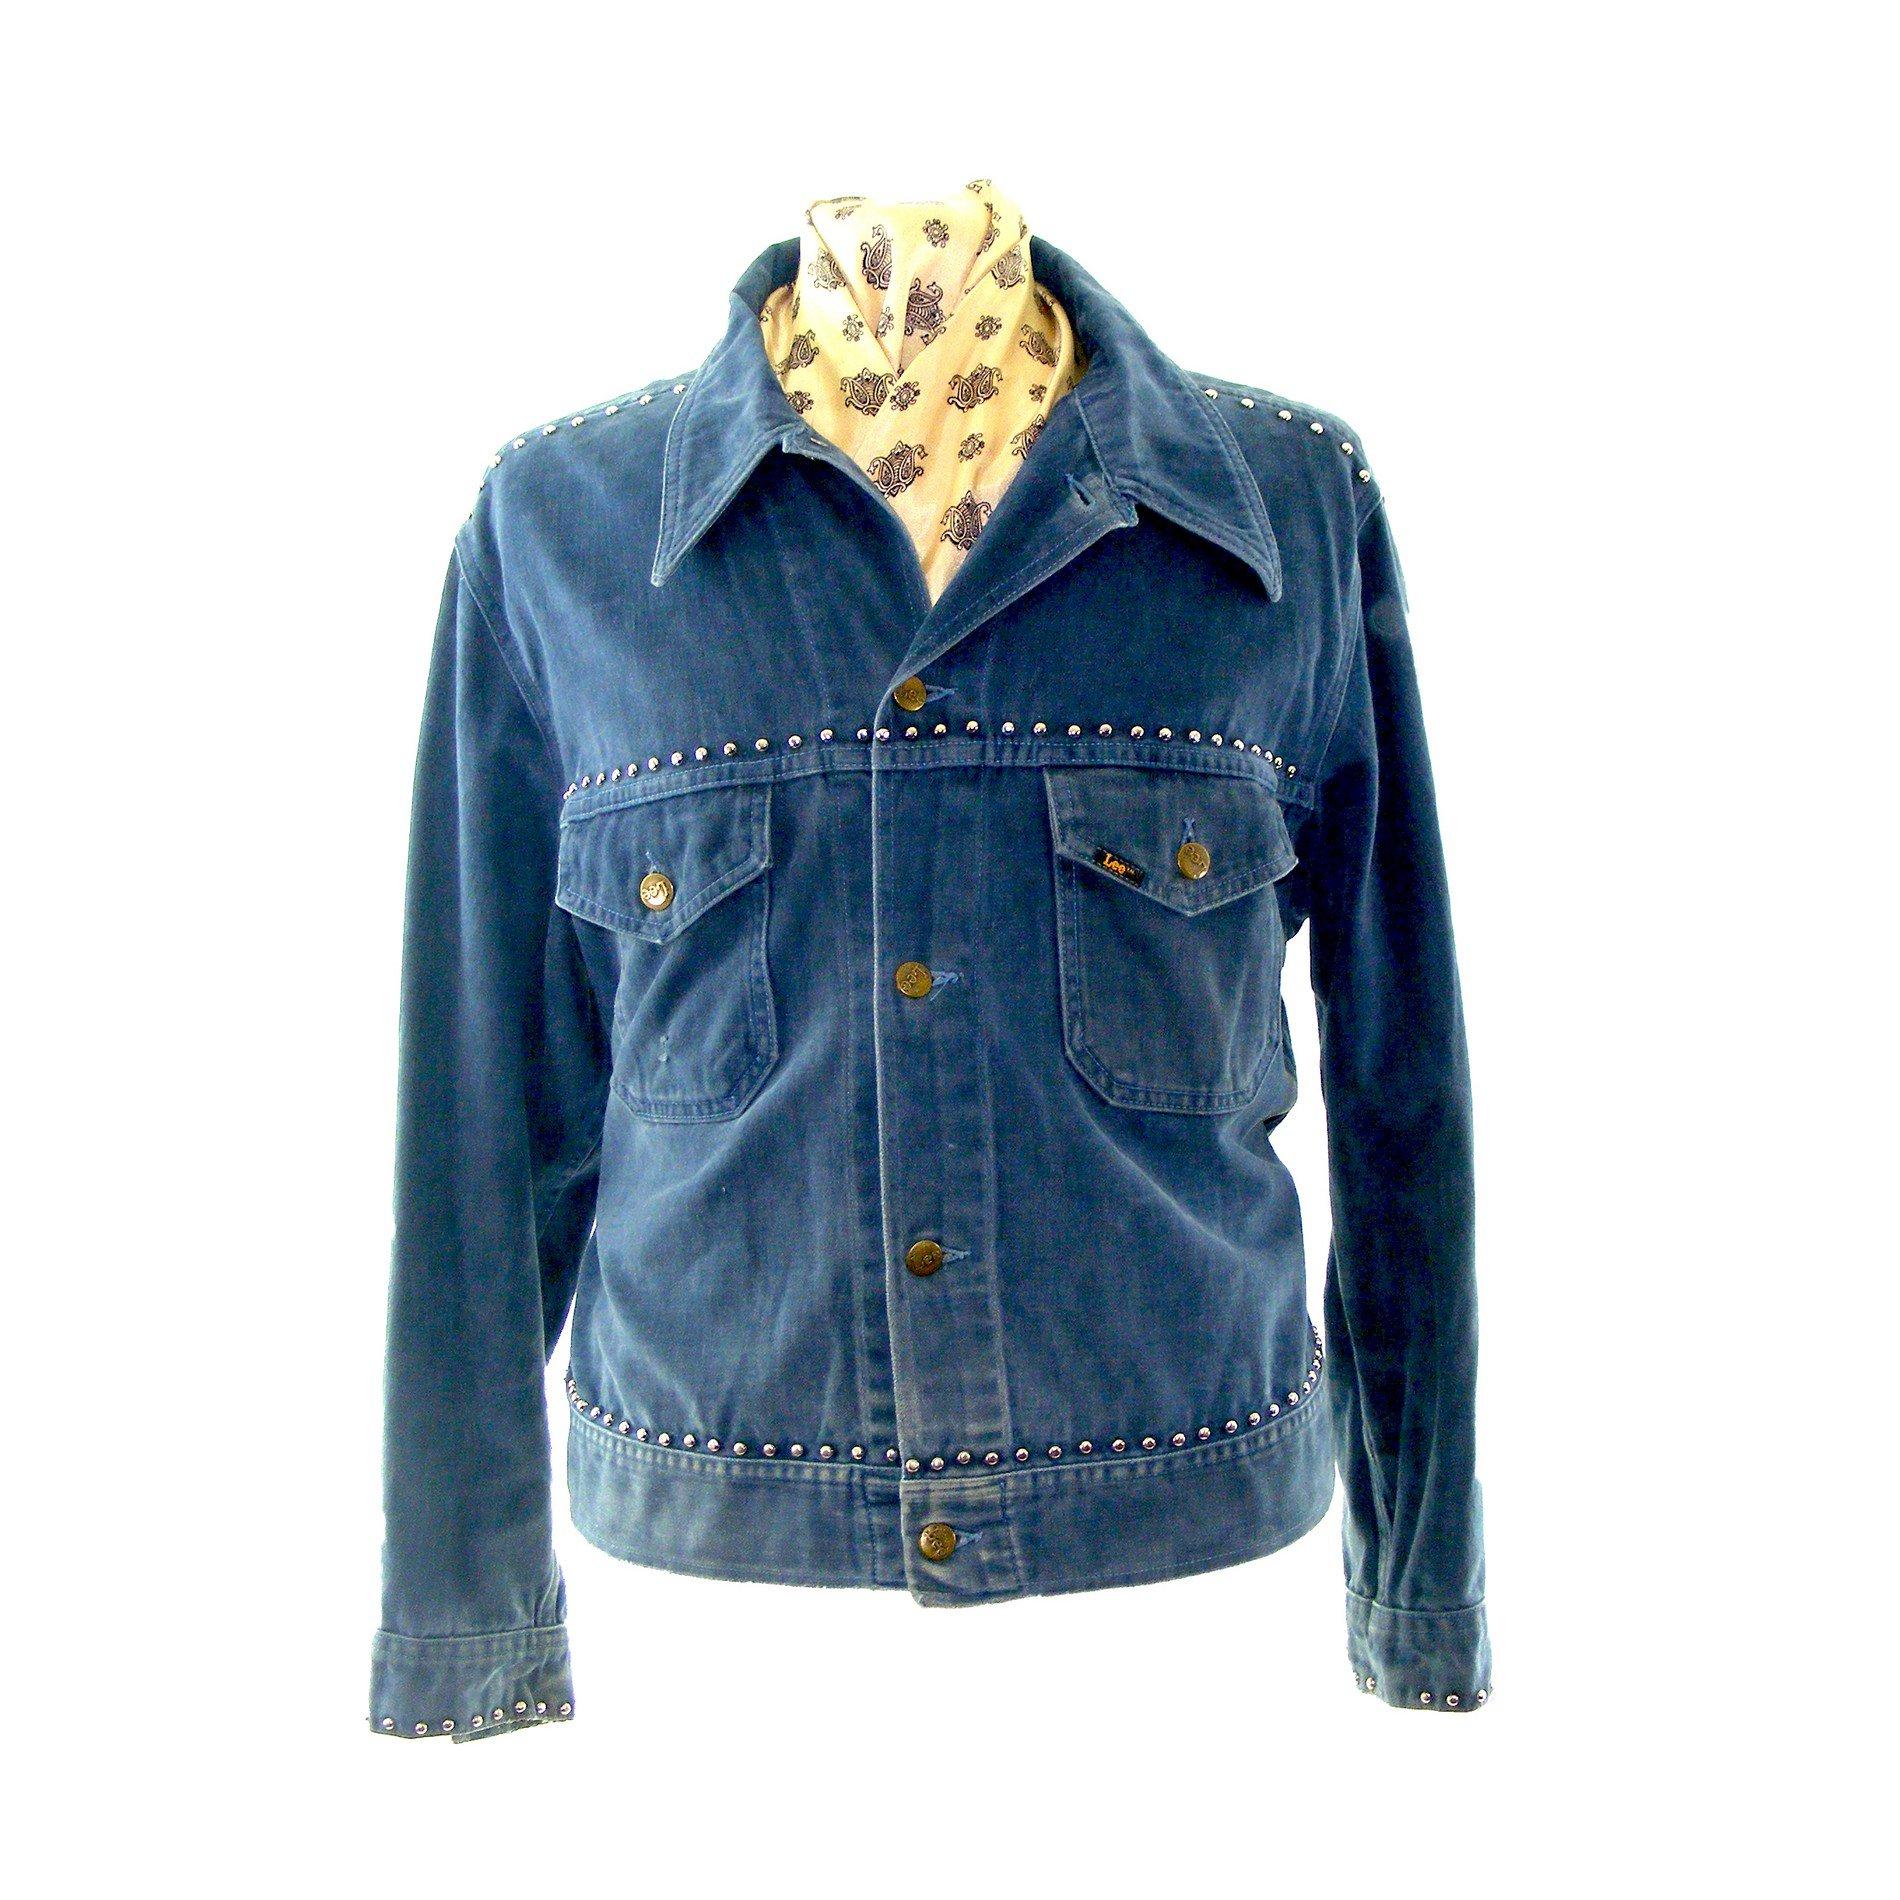 1970s Lee denim jacket  vintage 70s jean jacket  dark blue denim